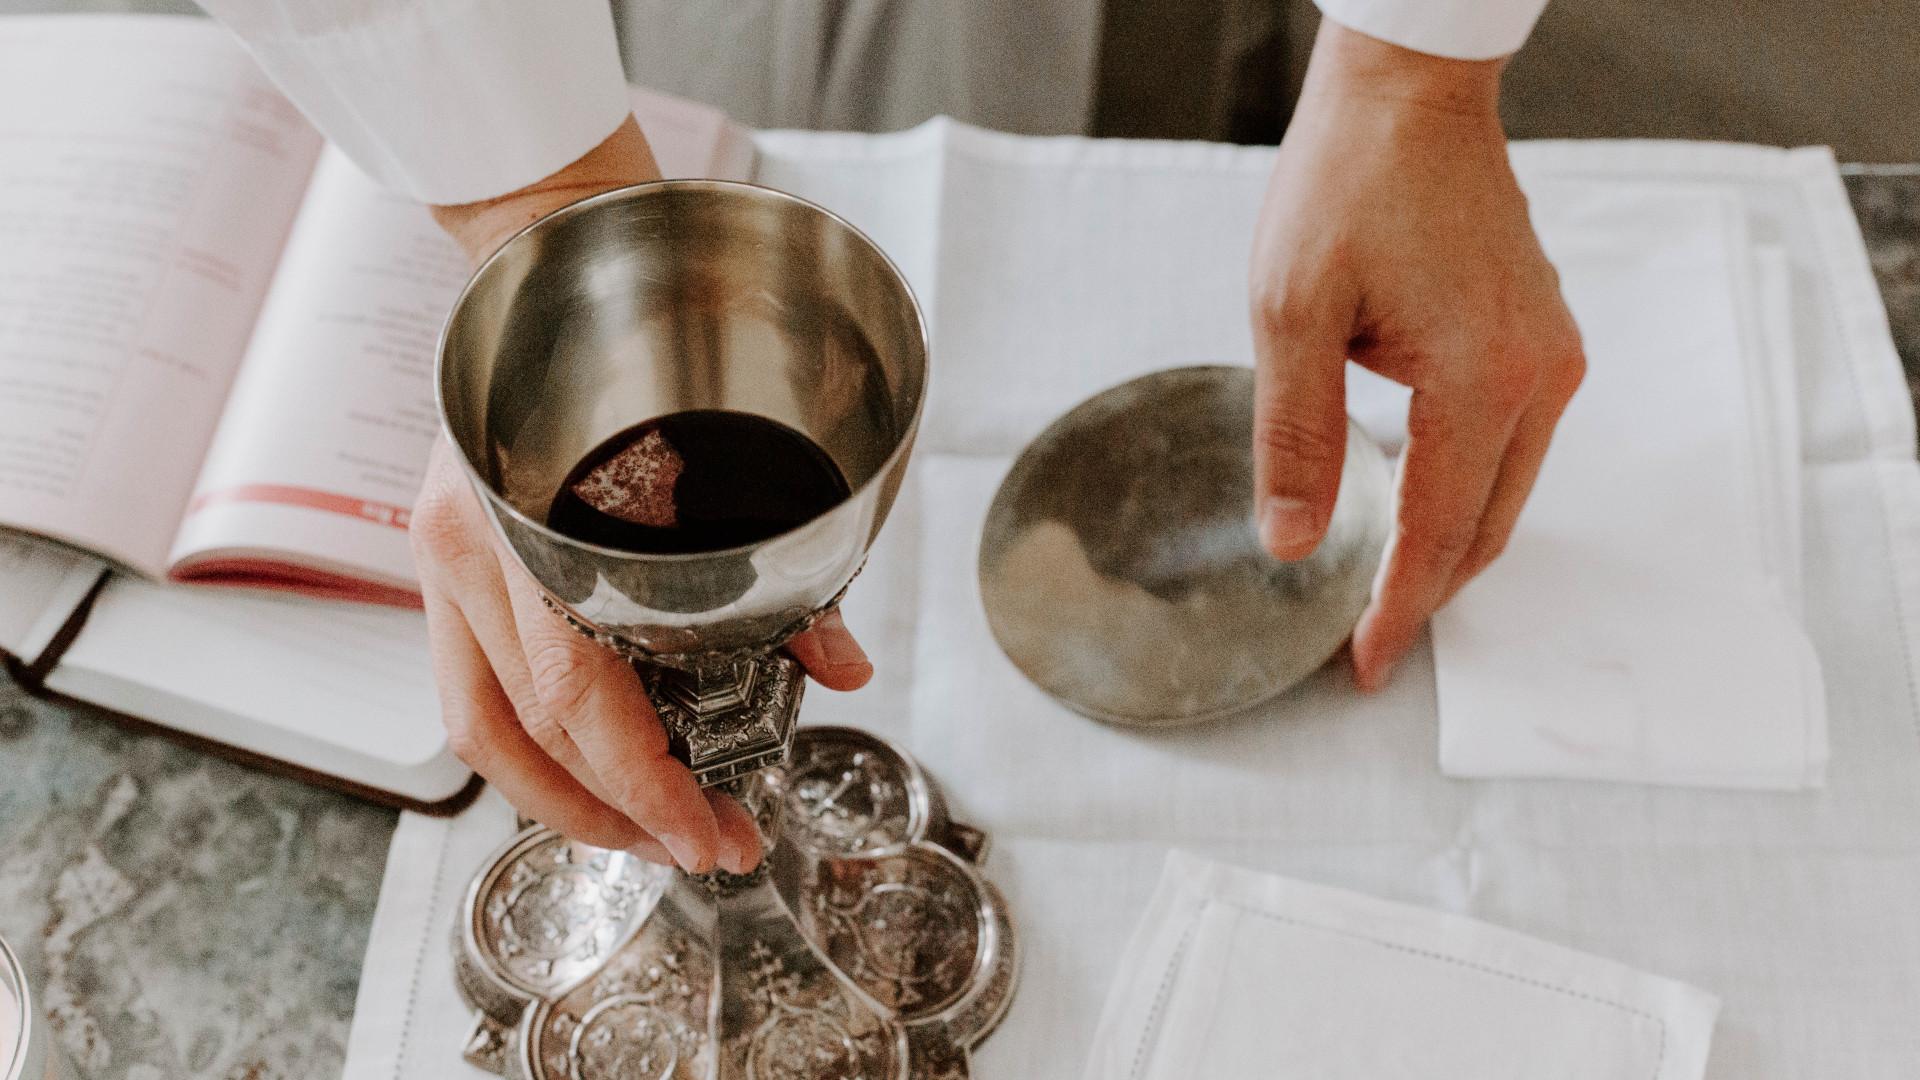 Church, Sacraments & Ministry